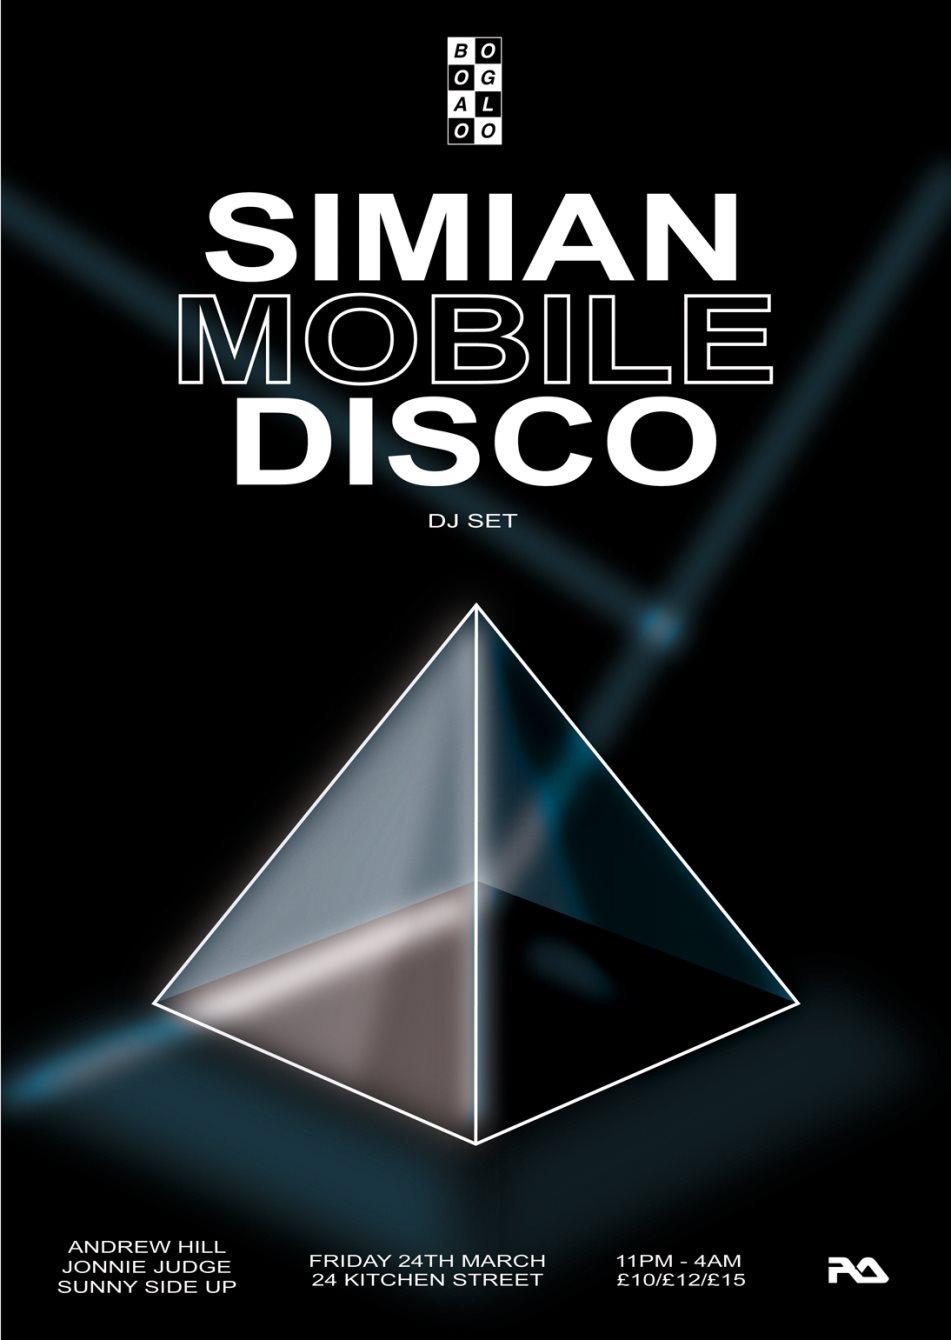 ra boogaloo simian mobile disco dj set at 24 kitchen street liverpool. Black Bedroom Furniture Sets. Home Design Ideas